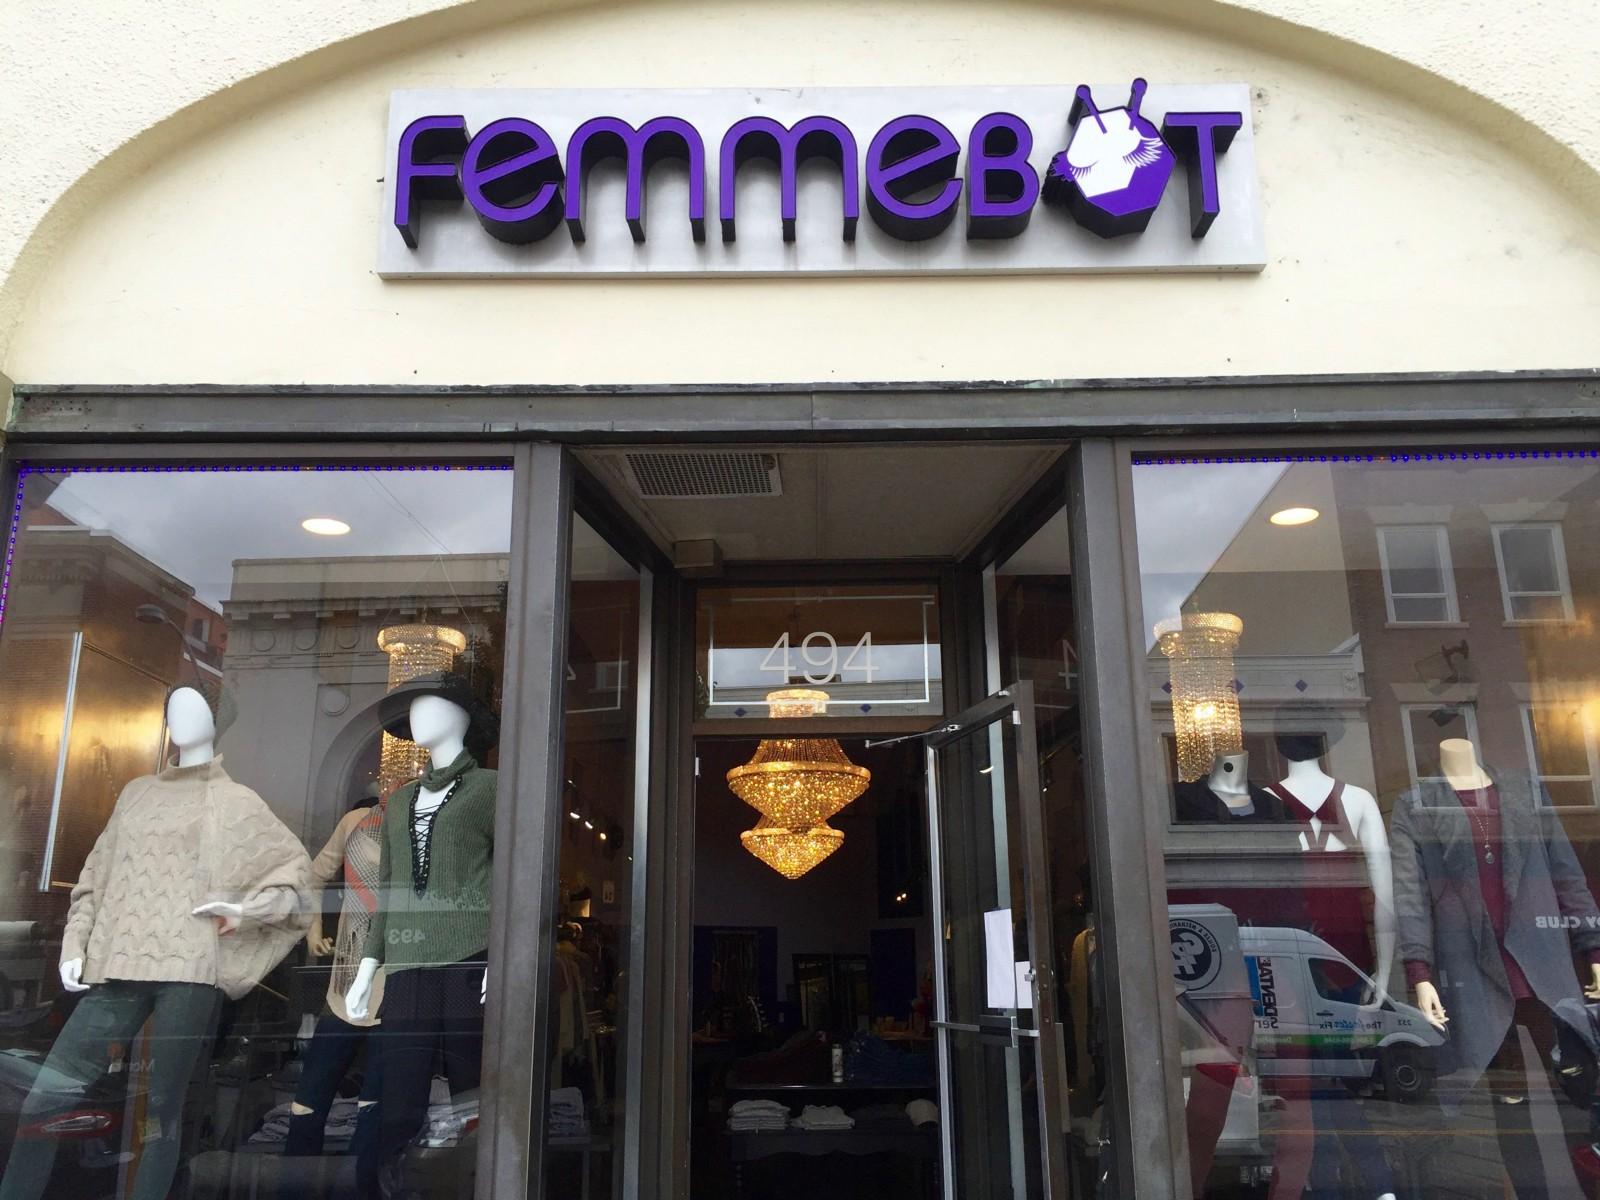 Femmebot: Where Fierce Fashion and Powerful Women Collide